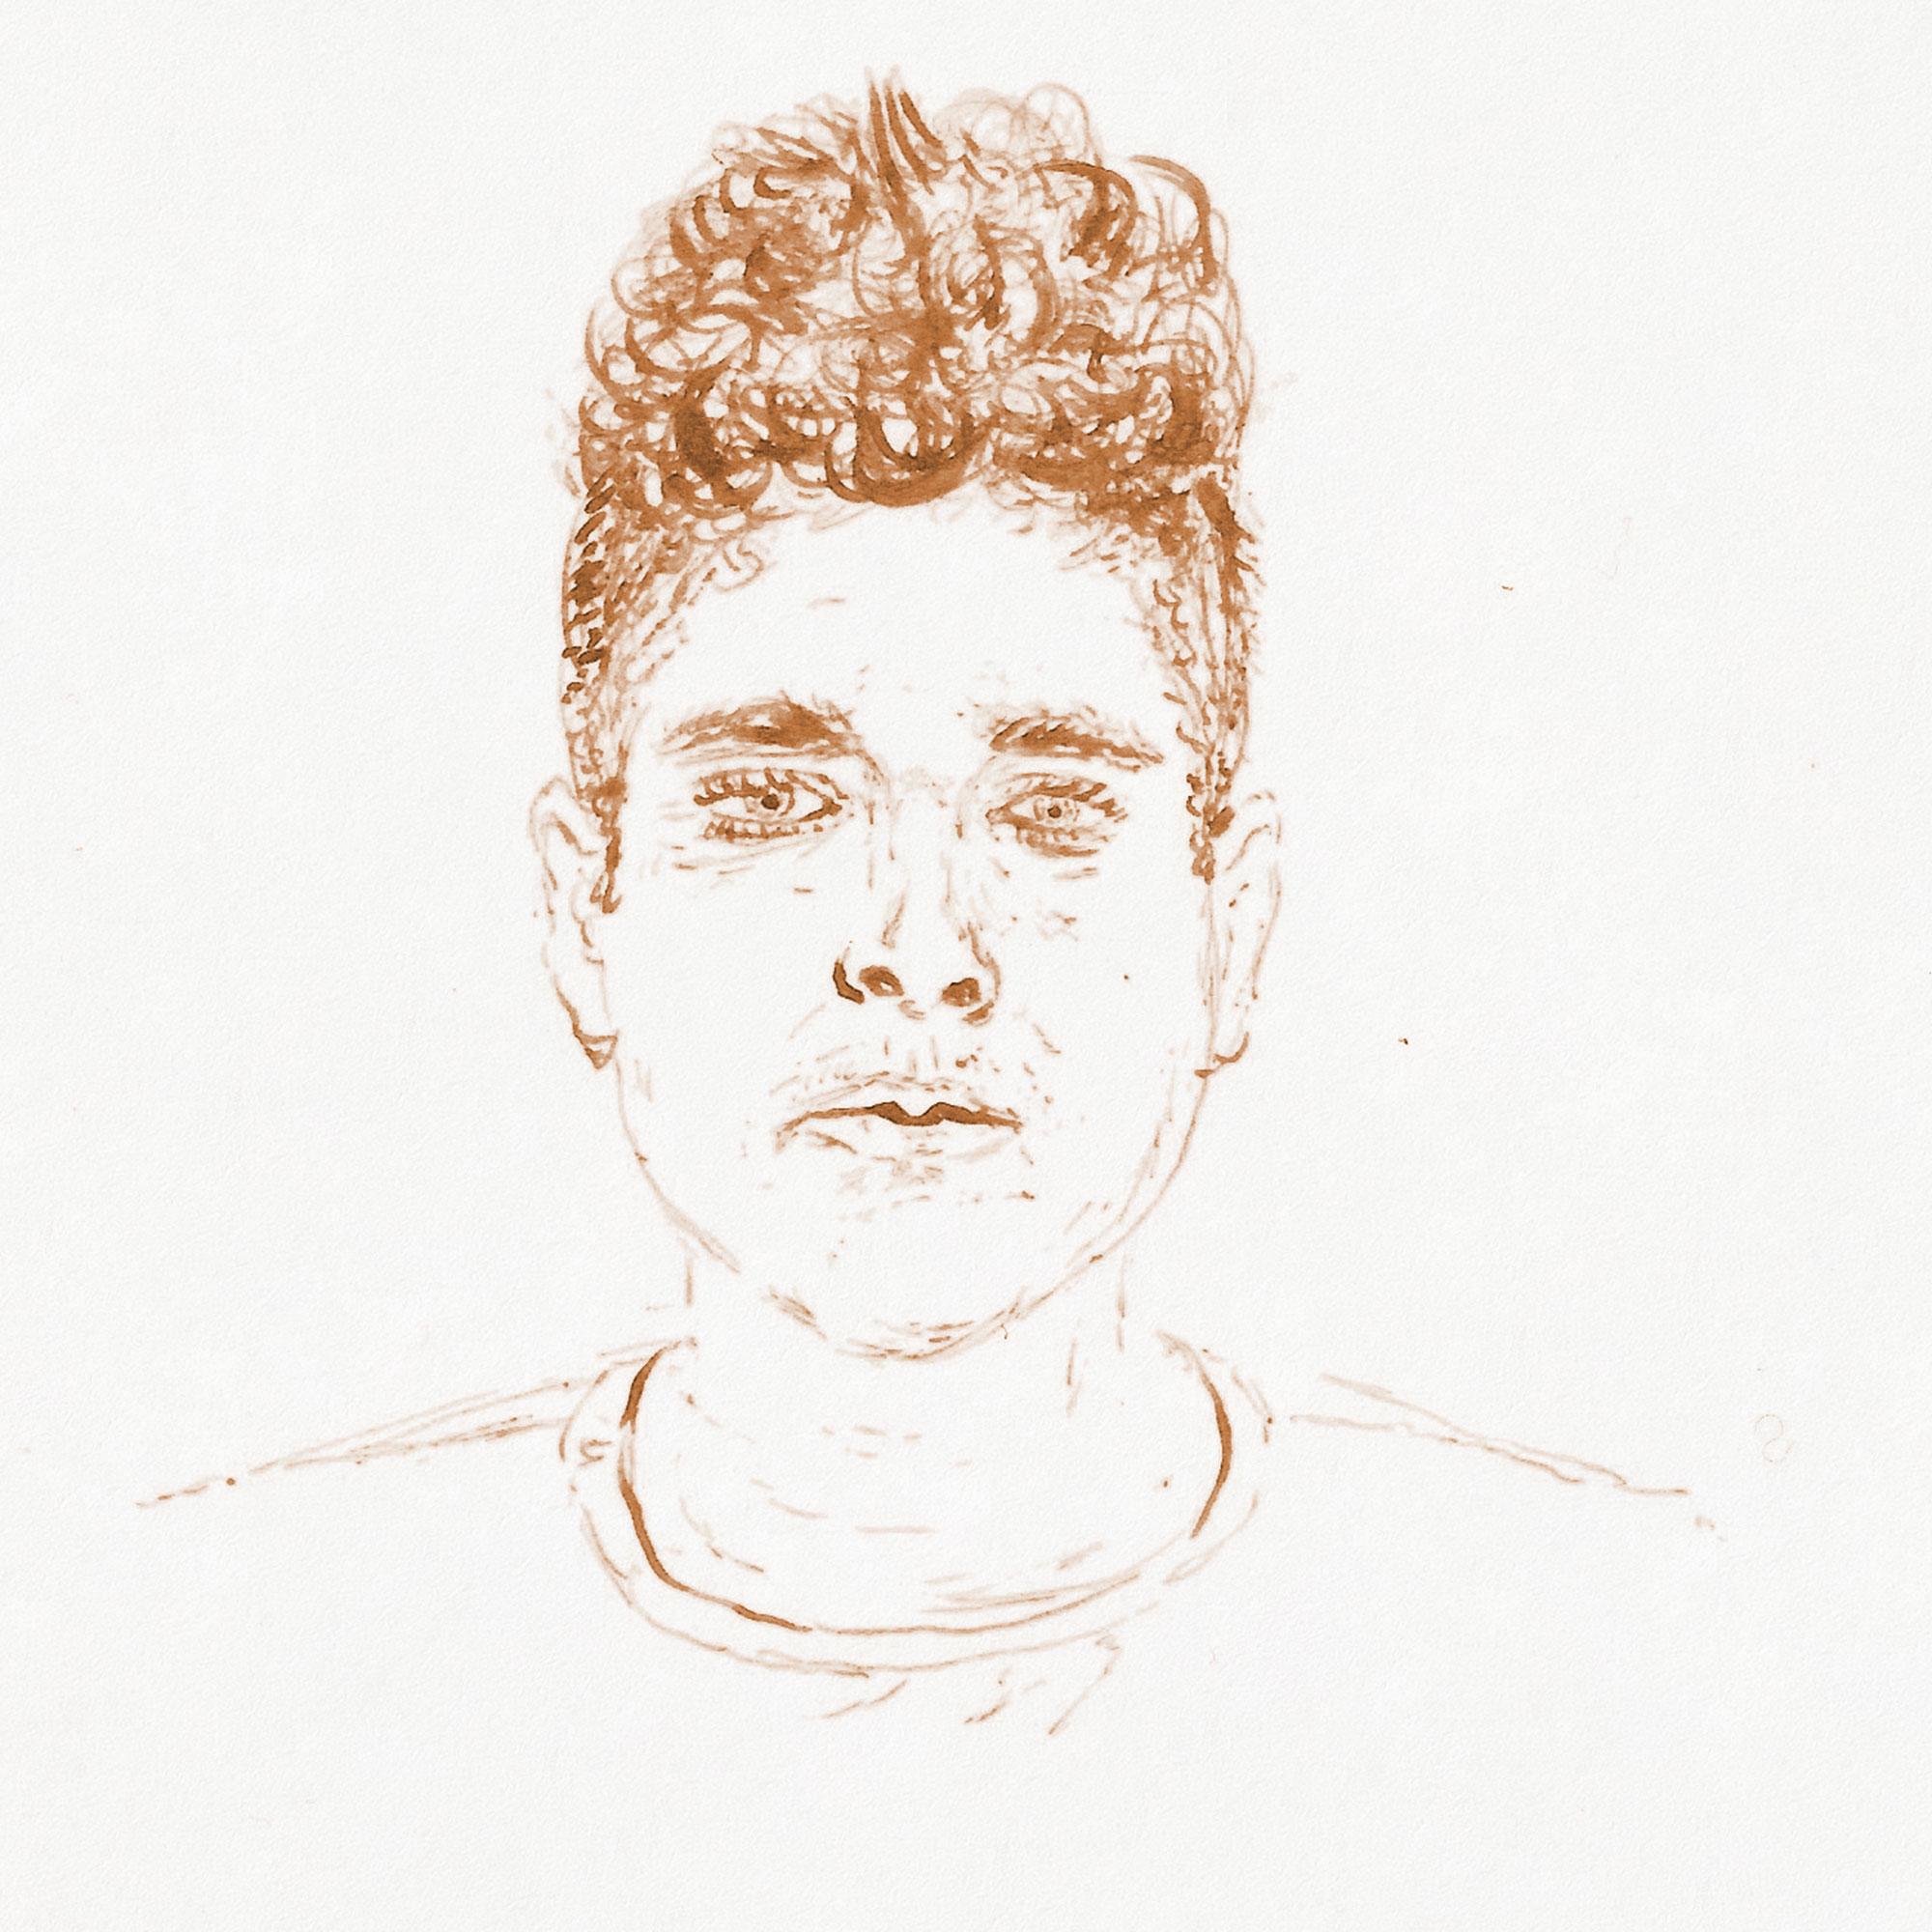 João Vitor Guarabira Nov 16 Detail